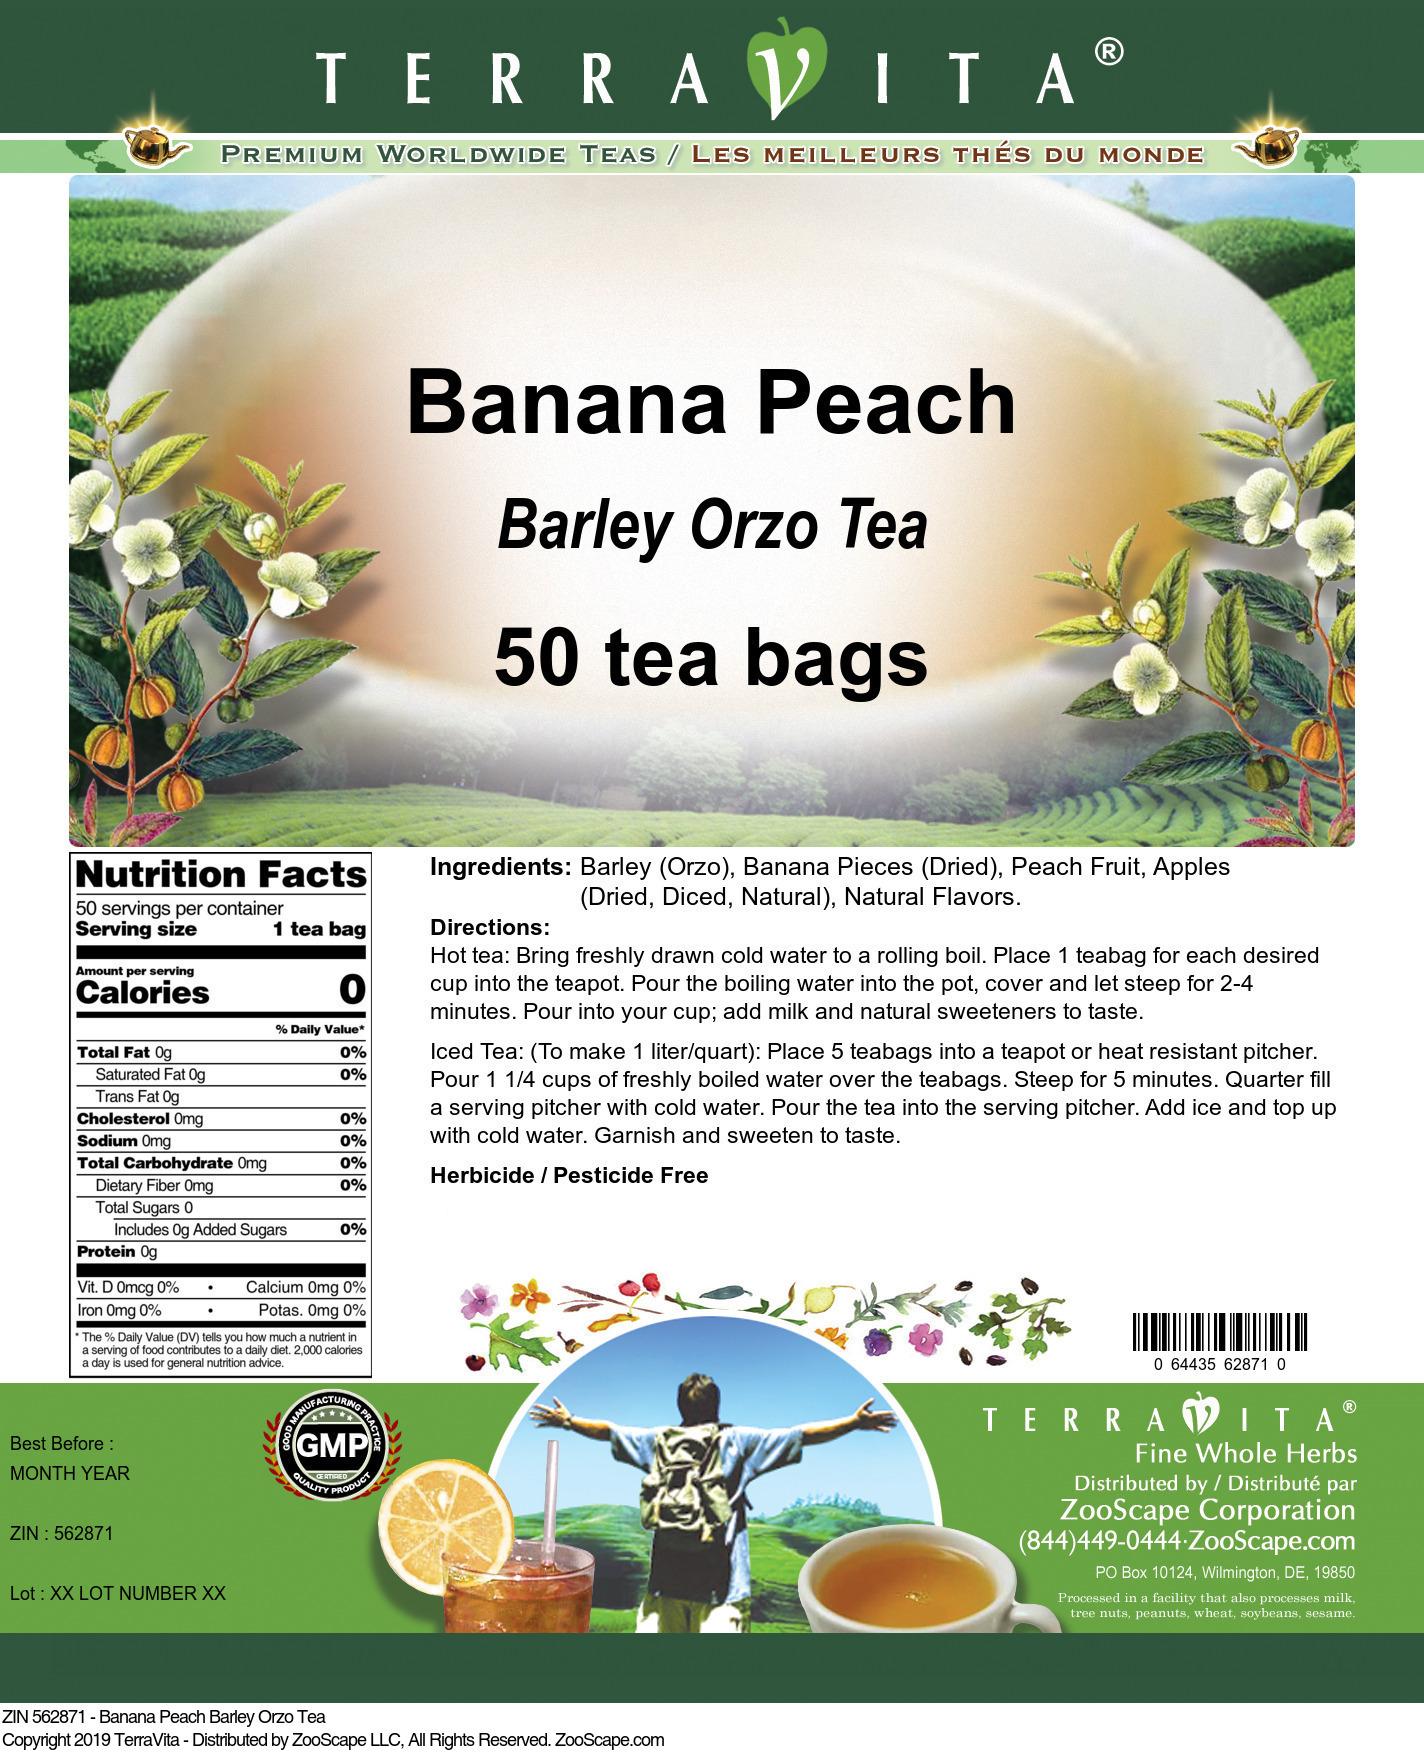 Banana Peach Barley Orzo Tea